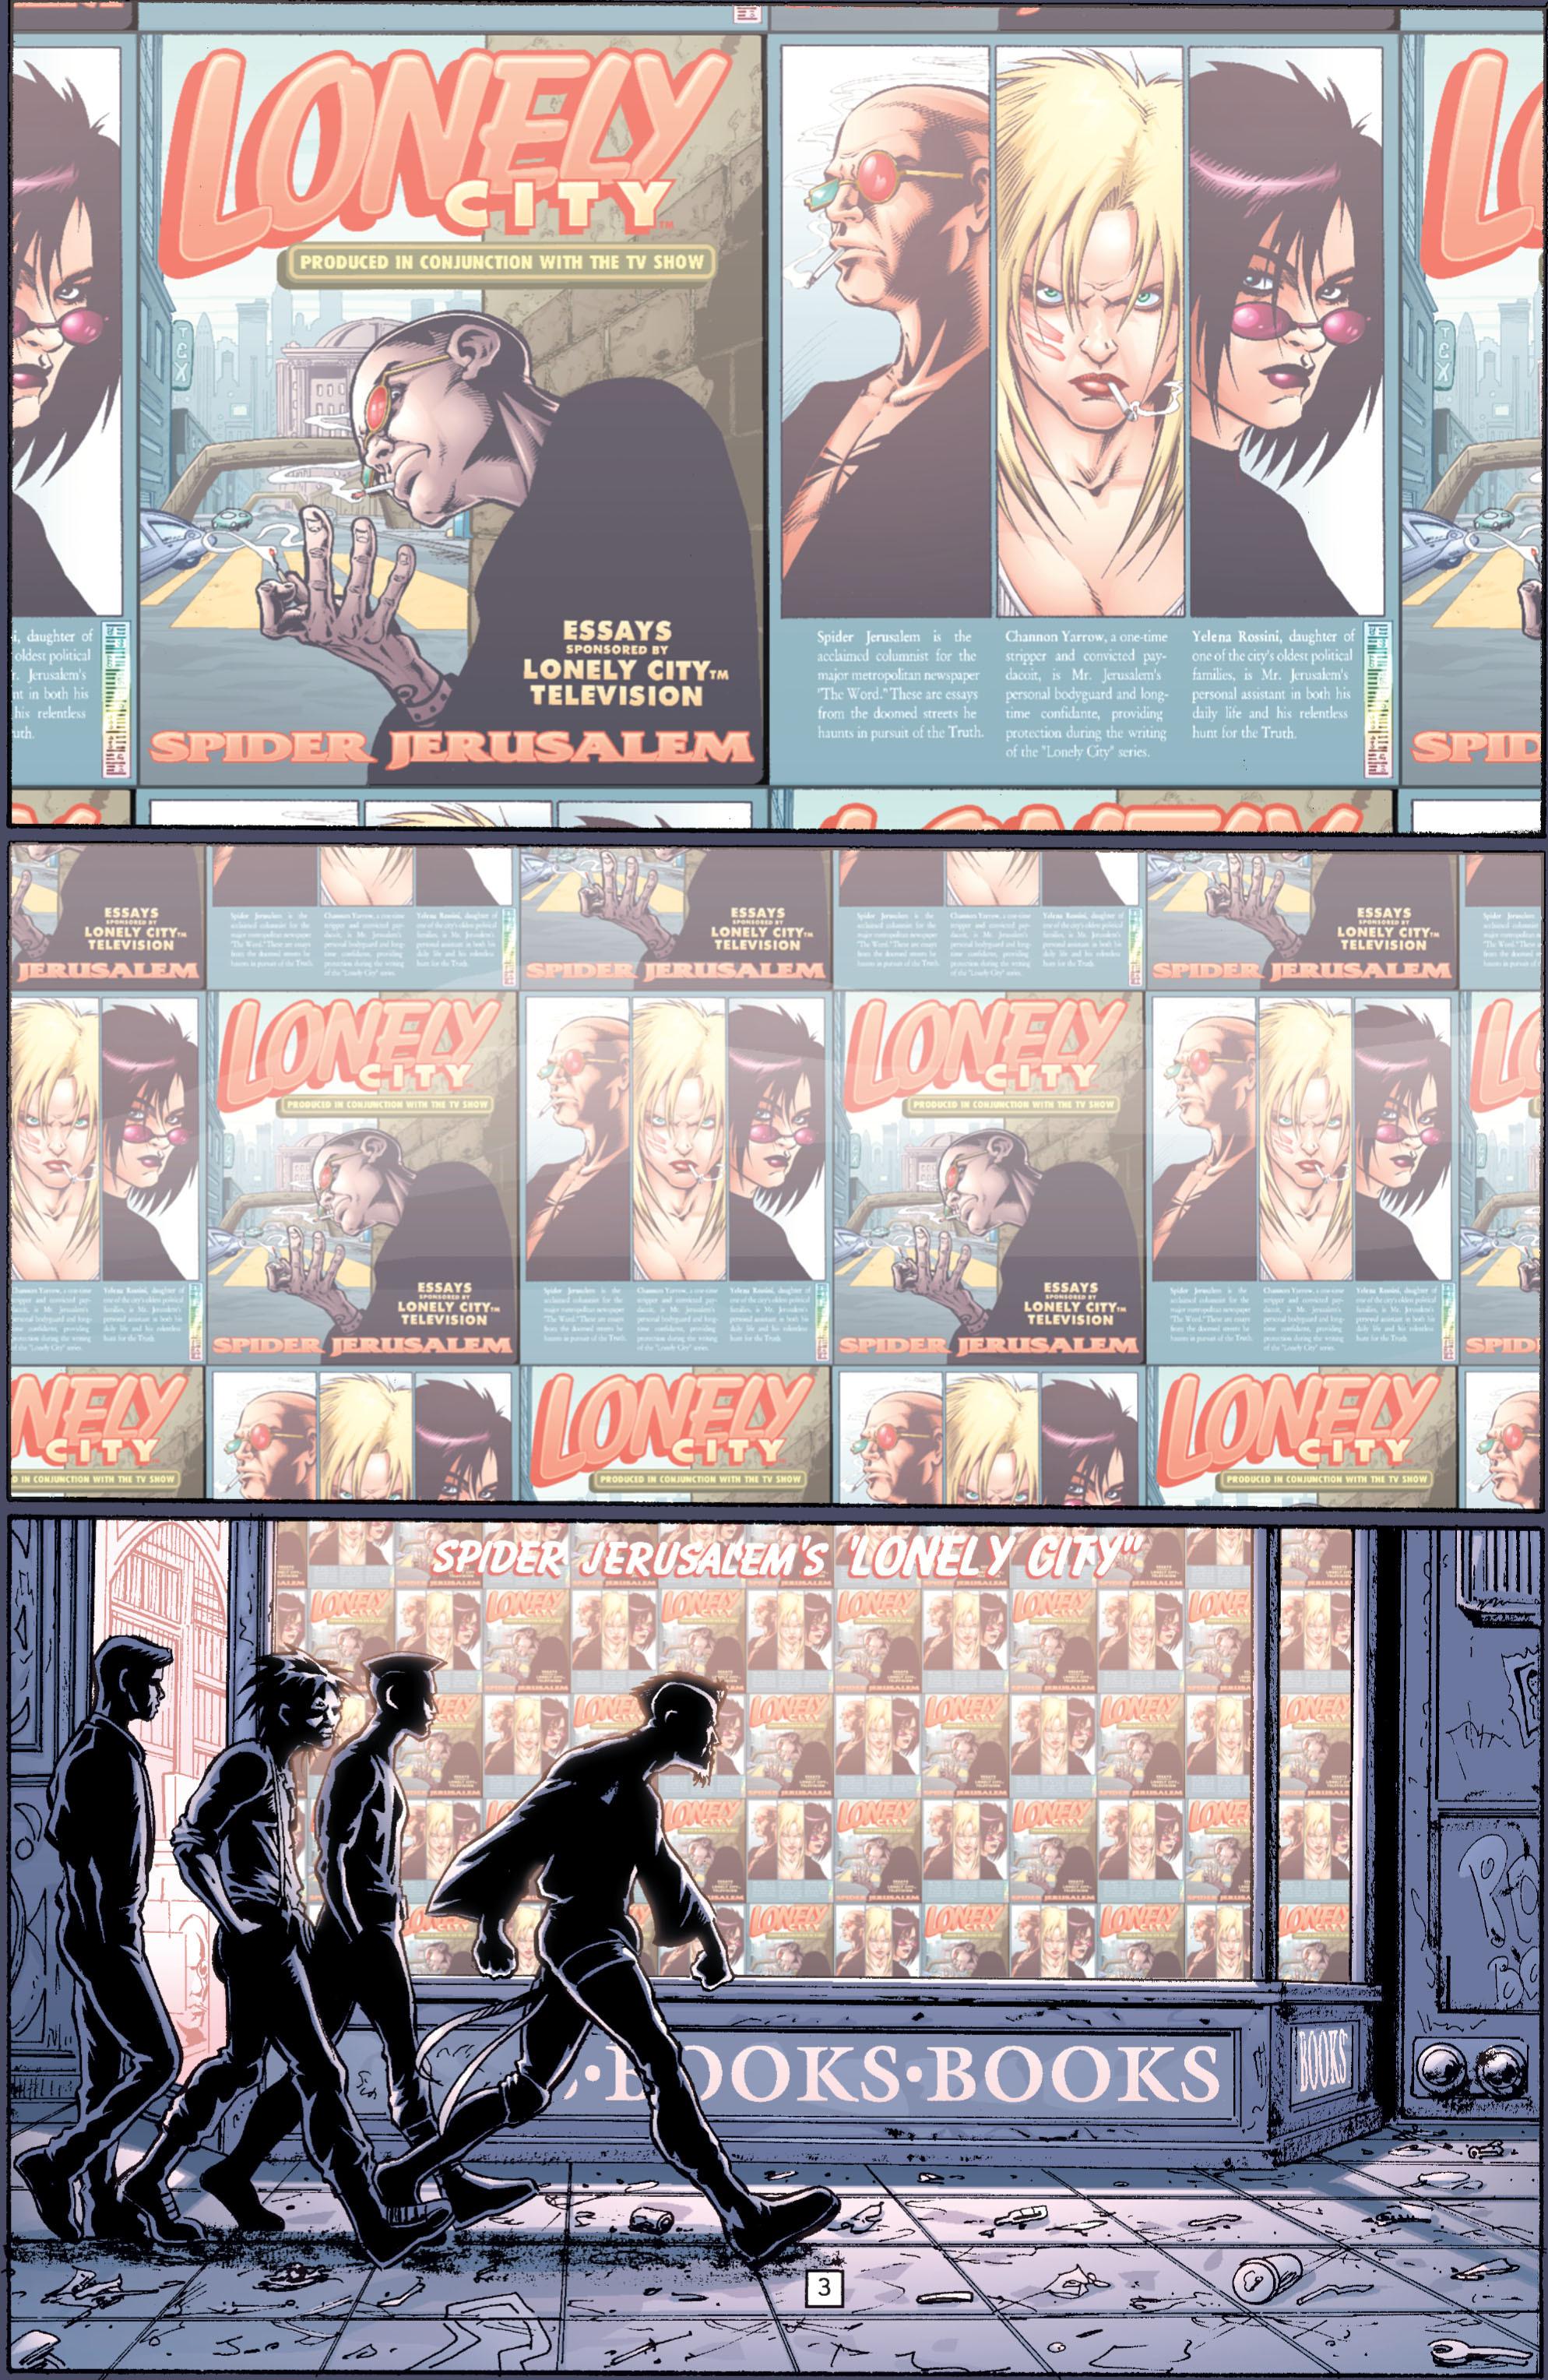 Read online Transmetropolitan comic -  Issue #28 - 4